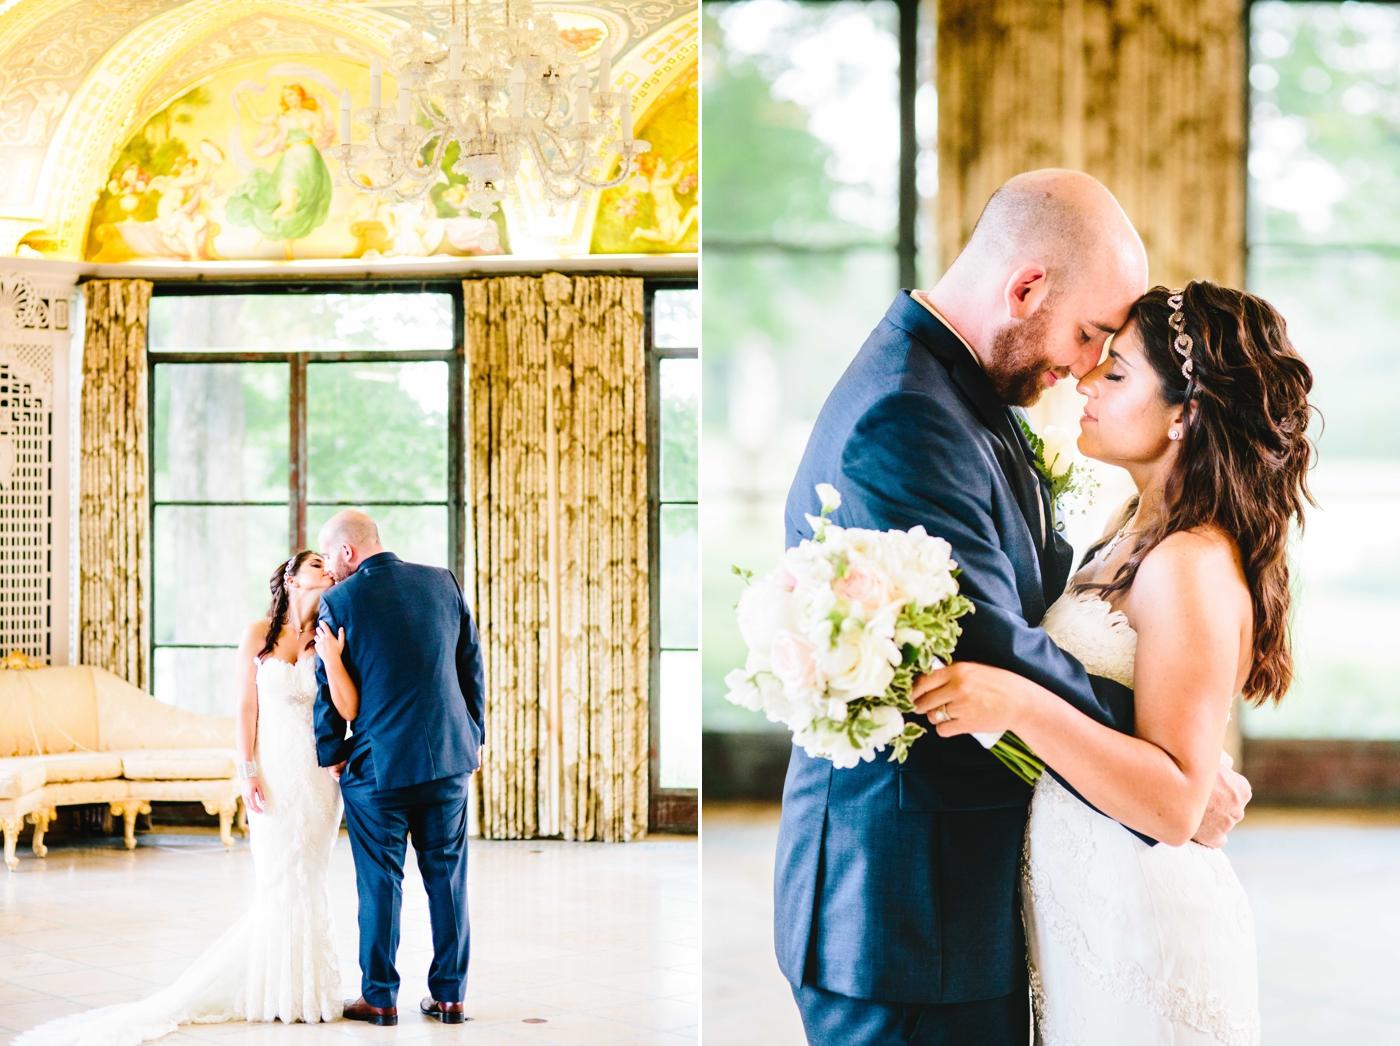 chicago-fine-art-wedding-photography-svihra4